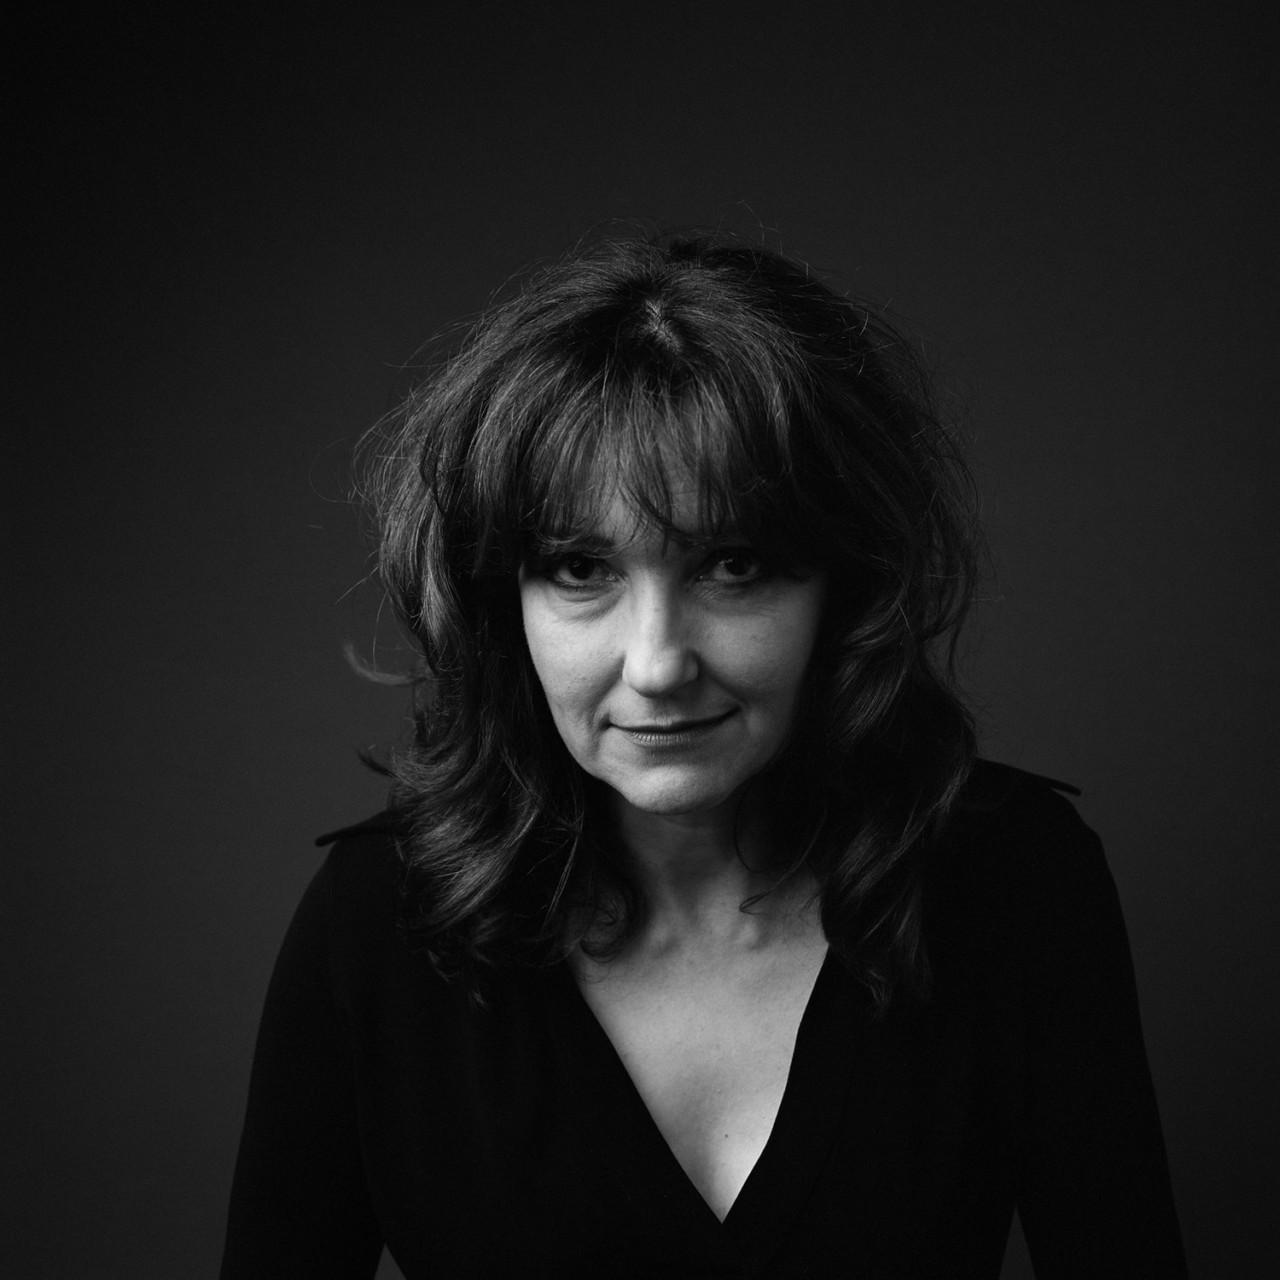 Chris Aadland Portraits